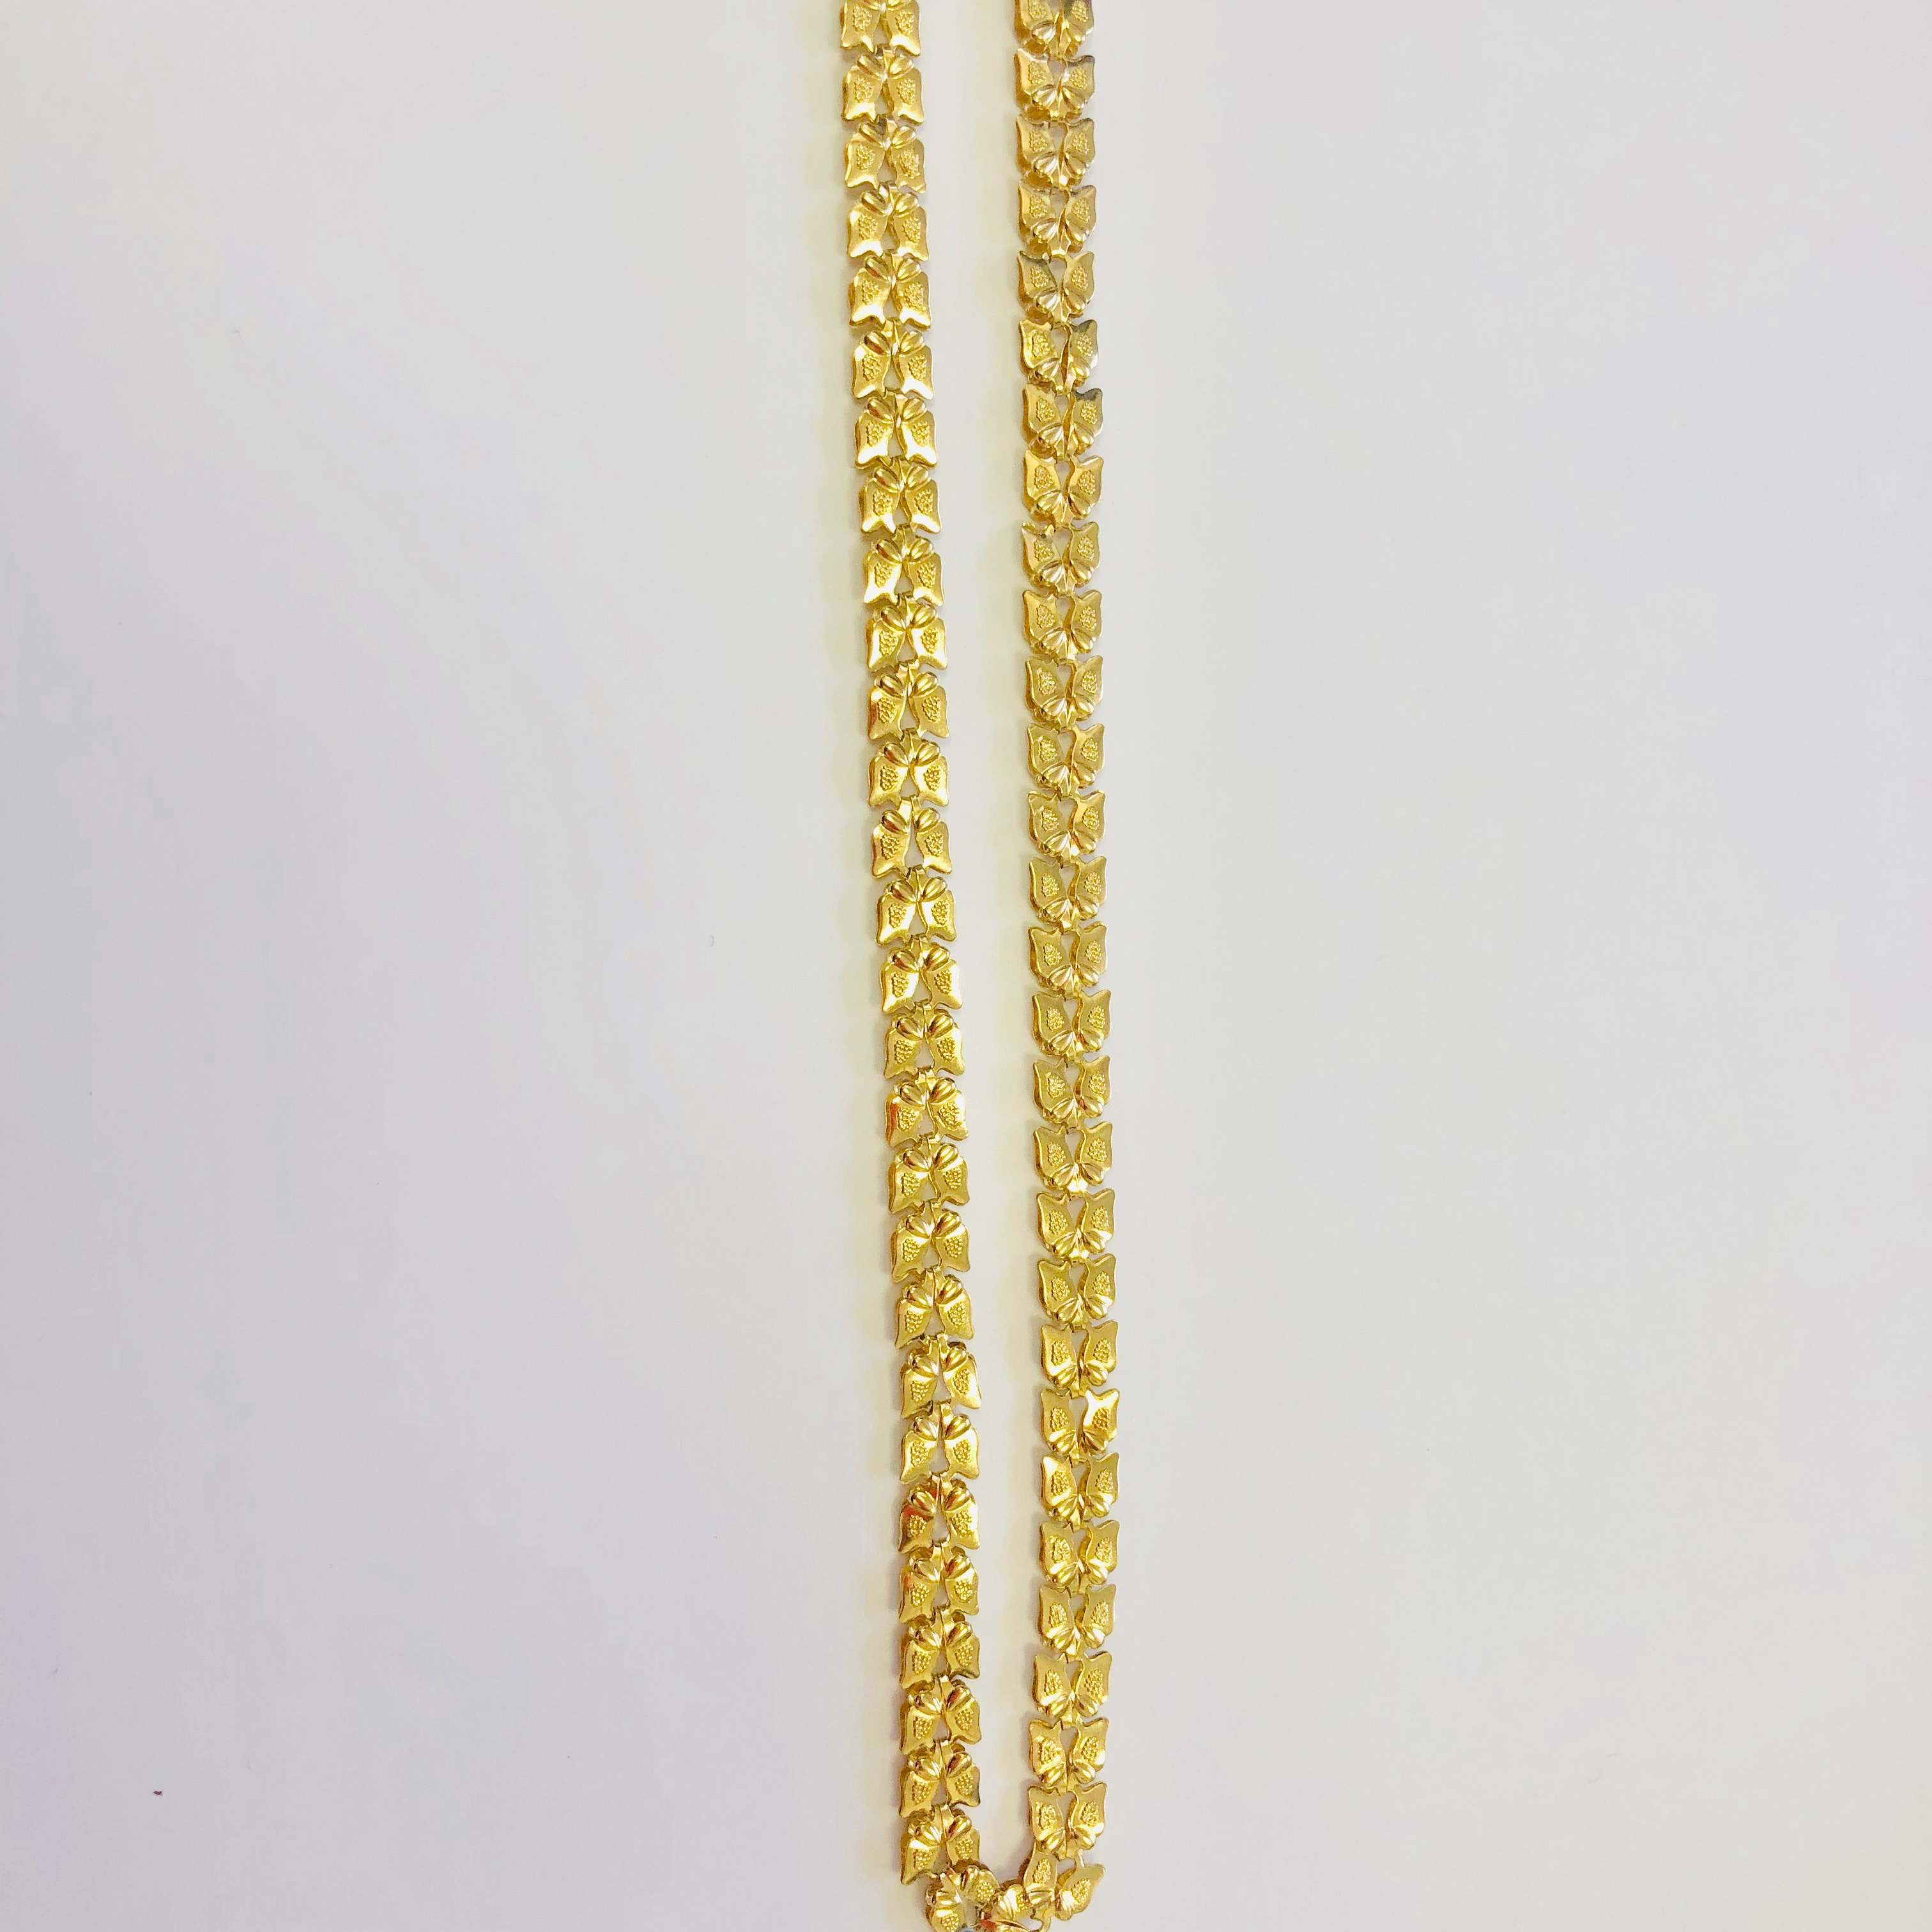 Фантазийная цепь из лимонного золота арт. ди 199 ди 199